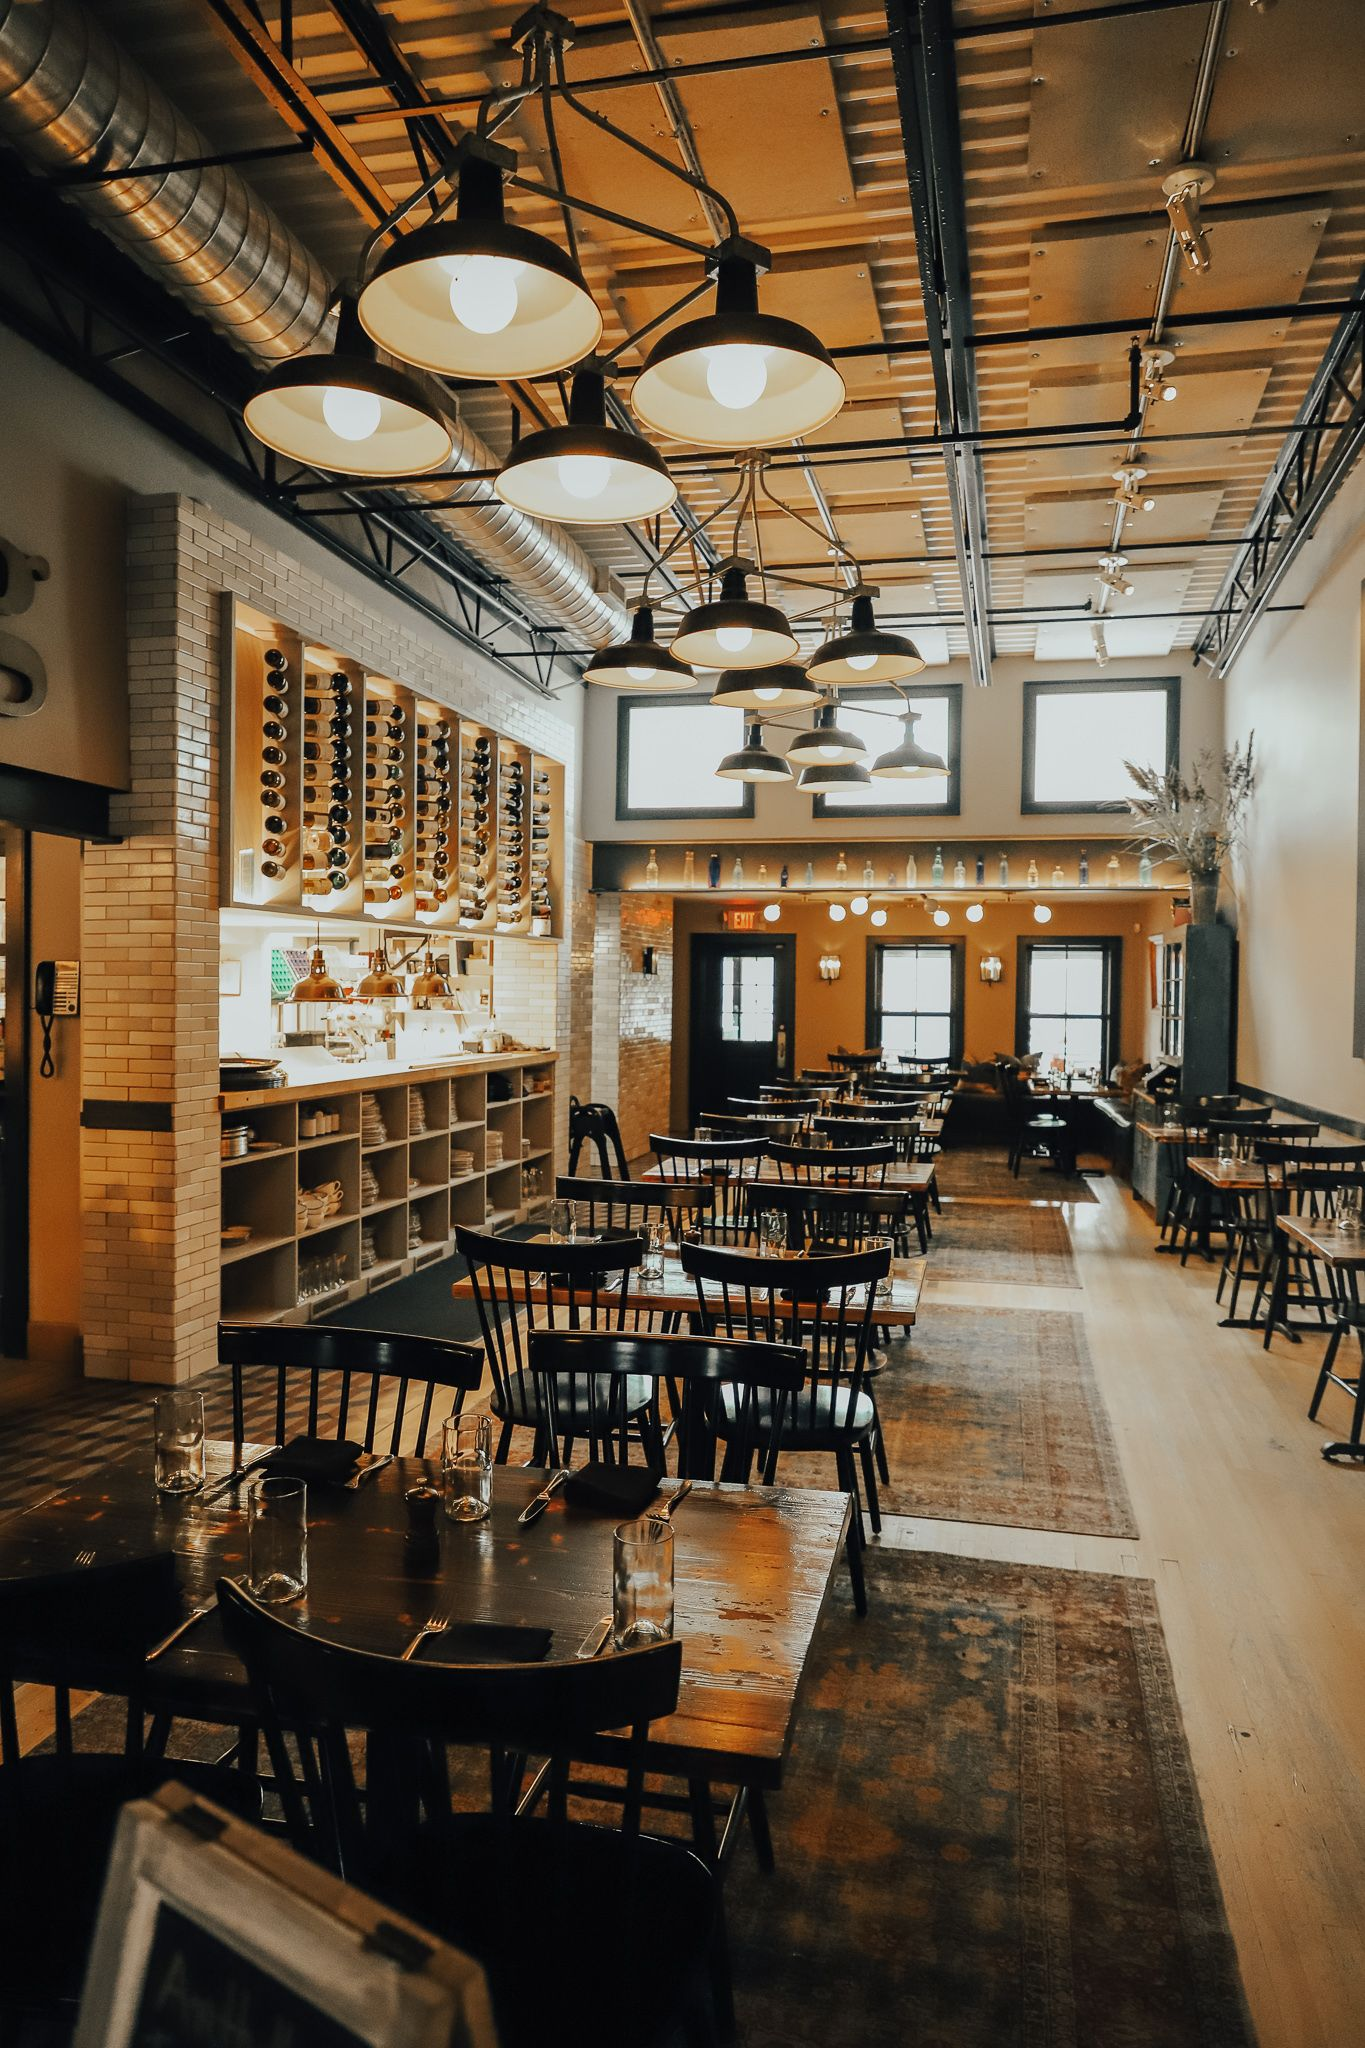 The Amsterdam Restaurant In Rhinebeck New York Clic